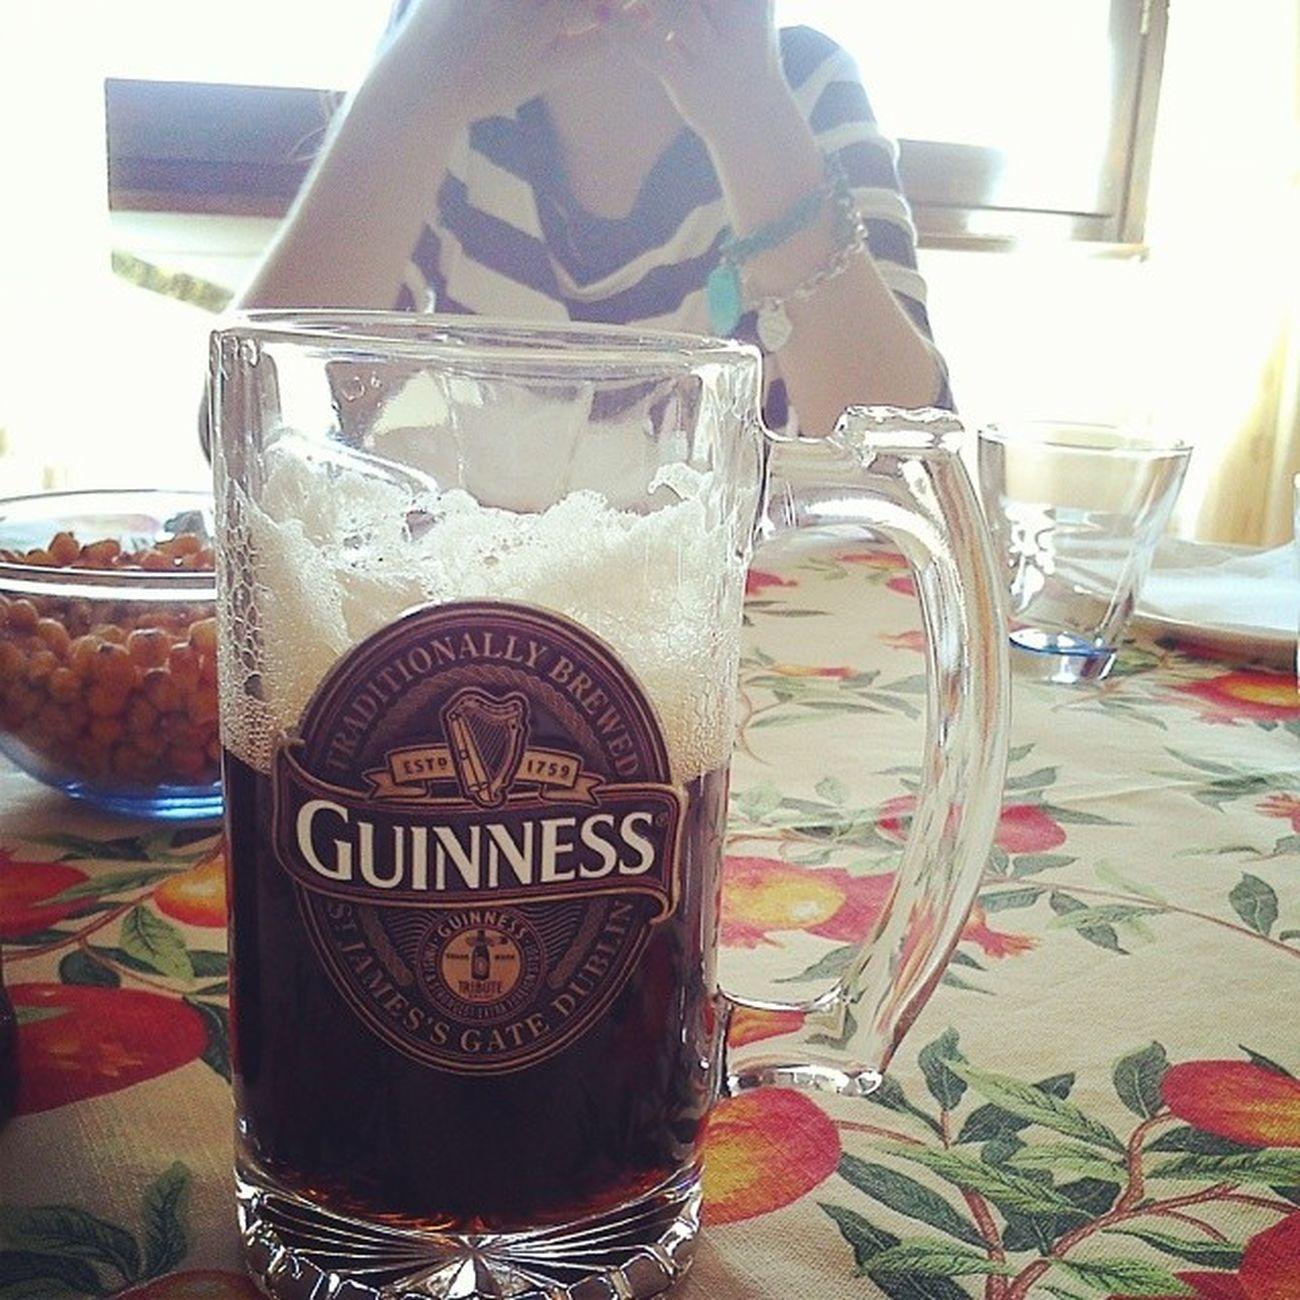 Happybdayweek Guinness lunch